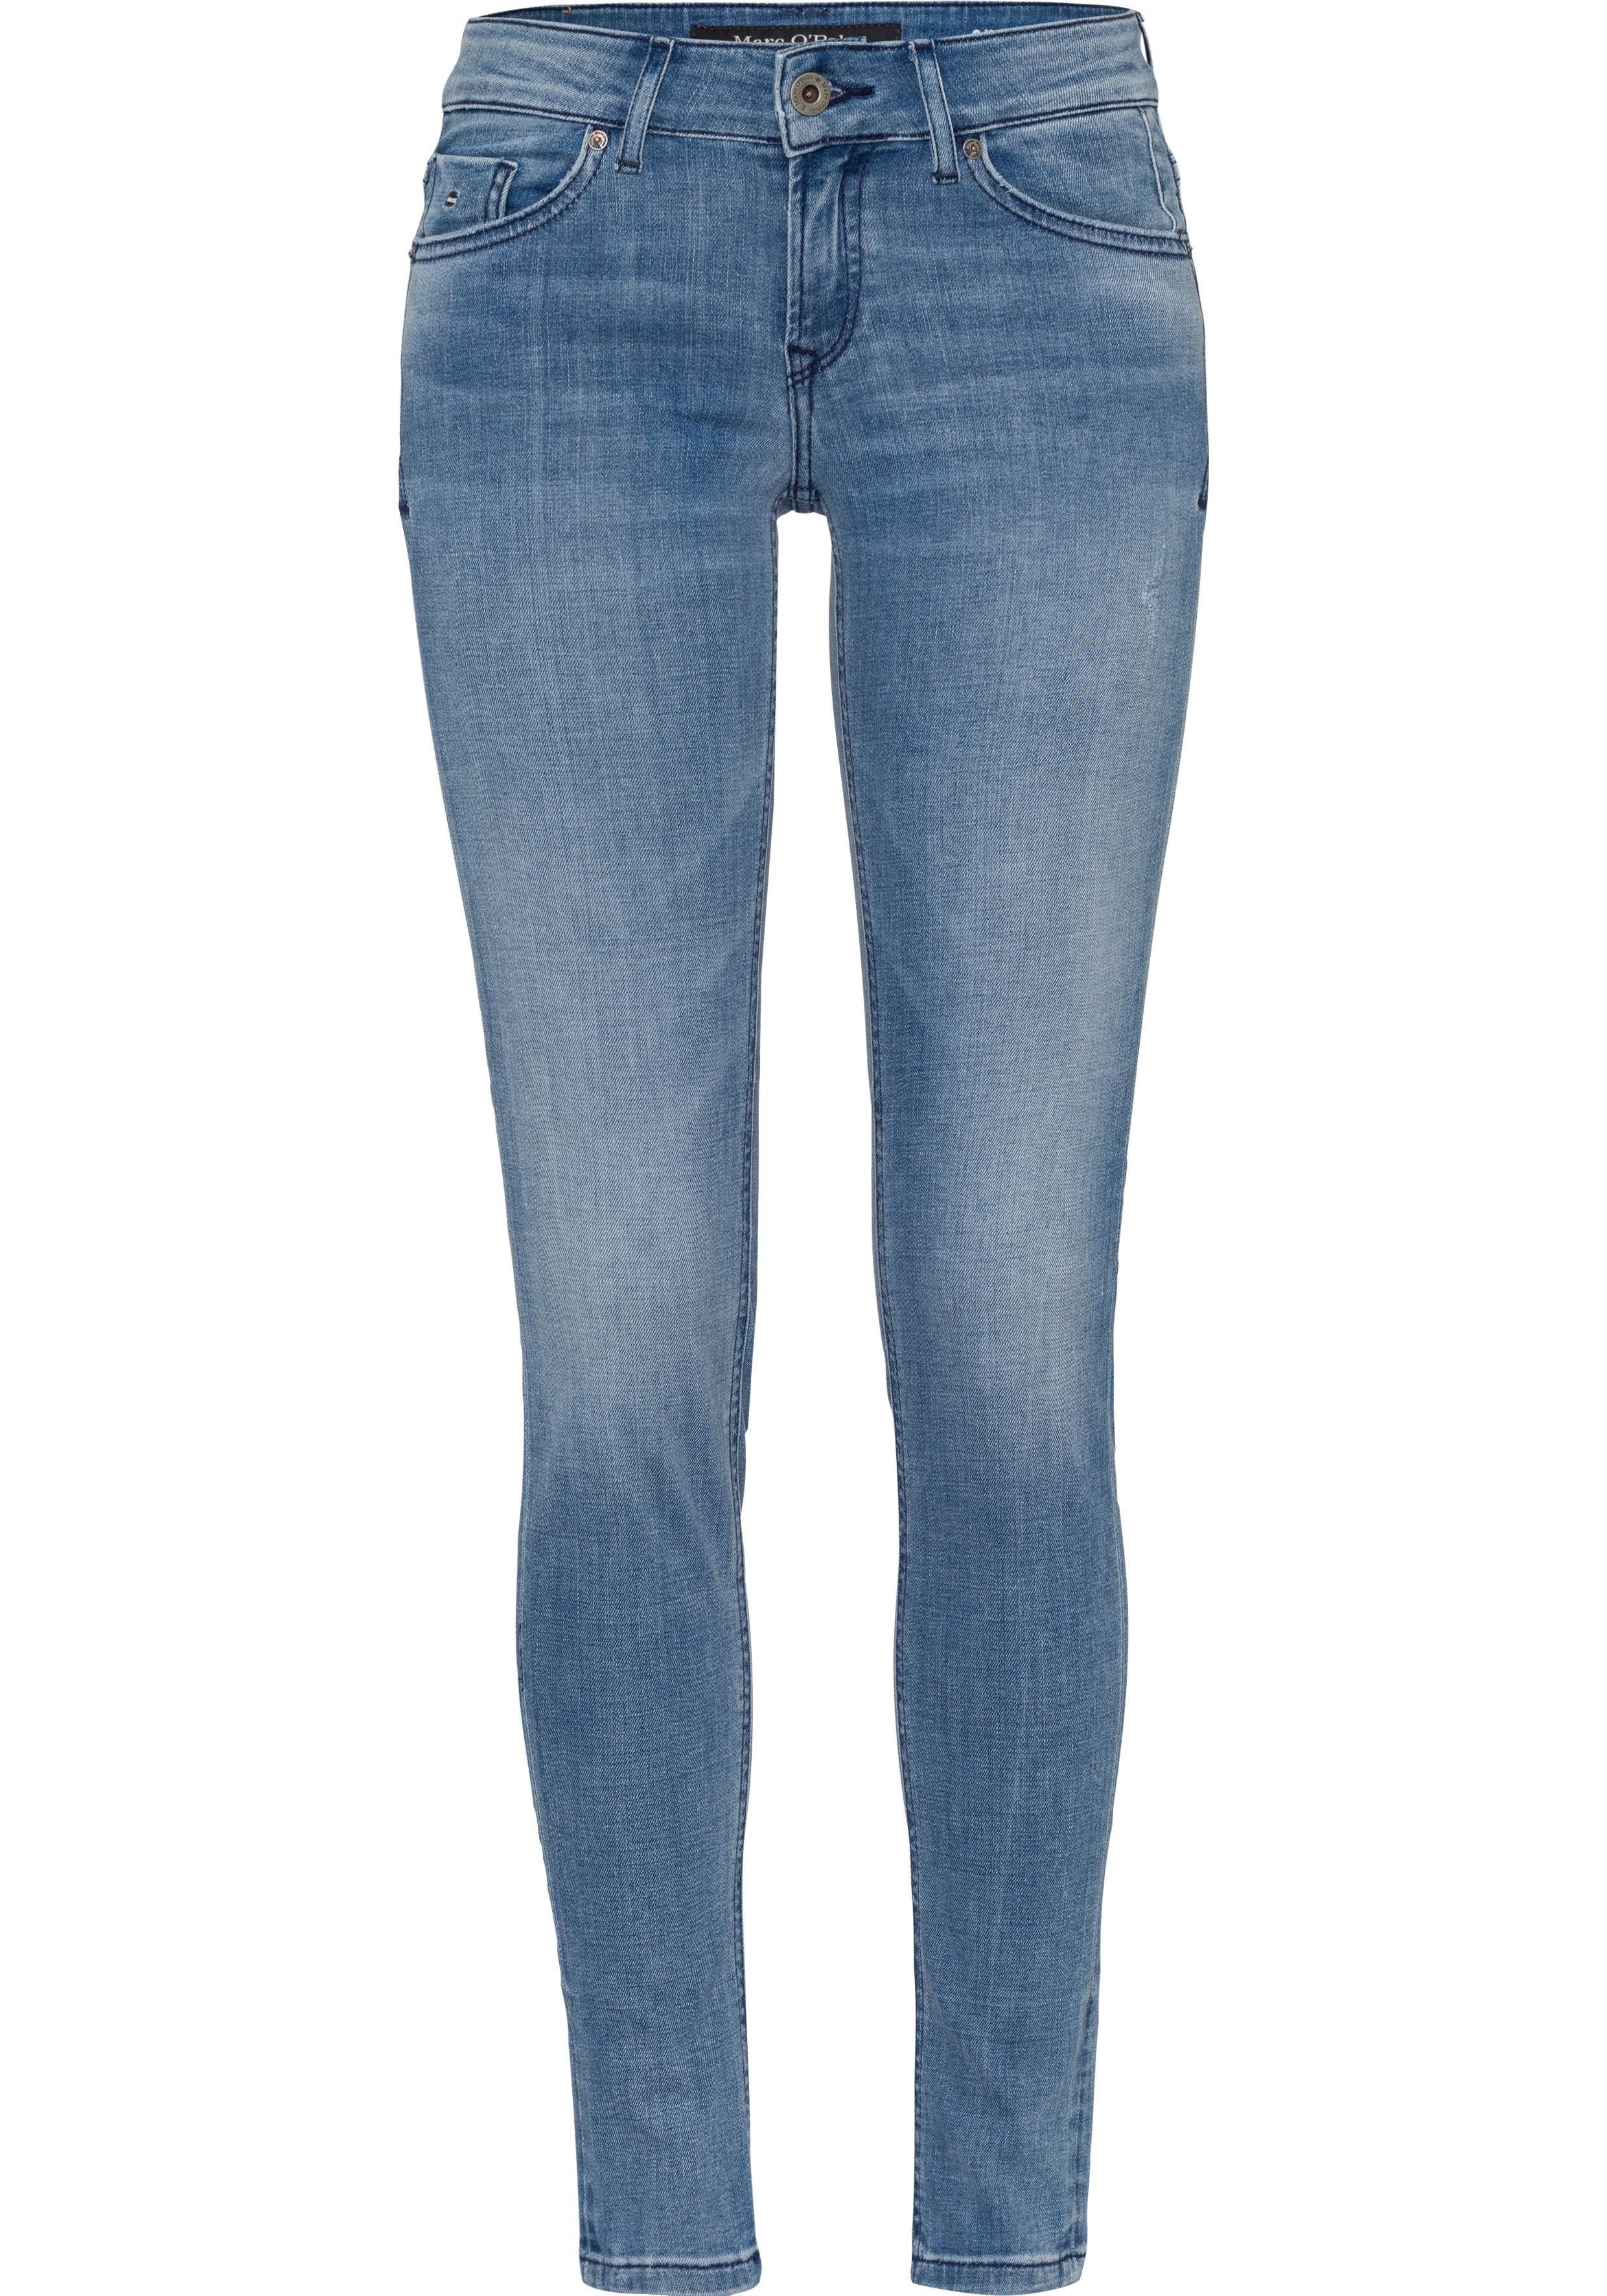 Marc O'Polo 5-pocket jeans »Skara Slim« nu online kopen bij OTTO